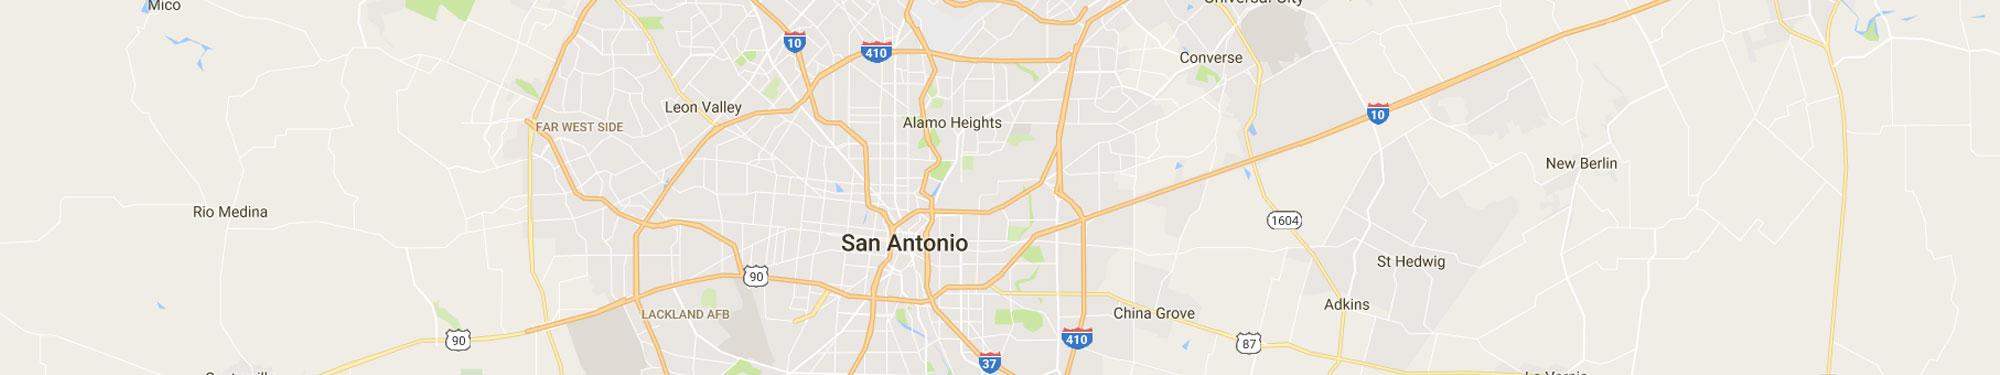 Best Car Transport San Antonio | 855-980-4100 | Mobile-Friendly